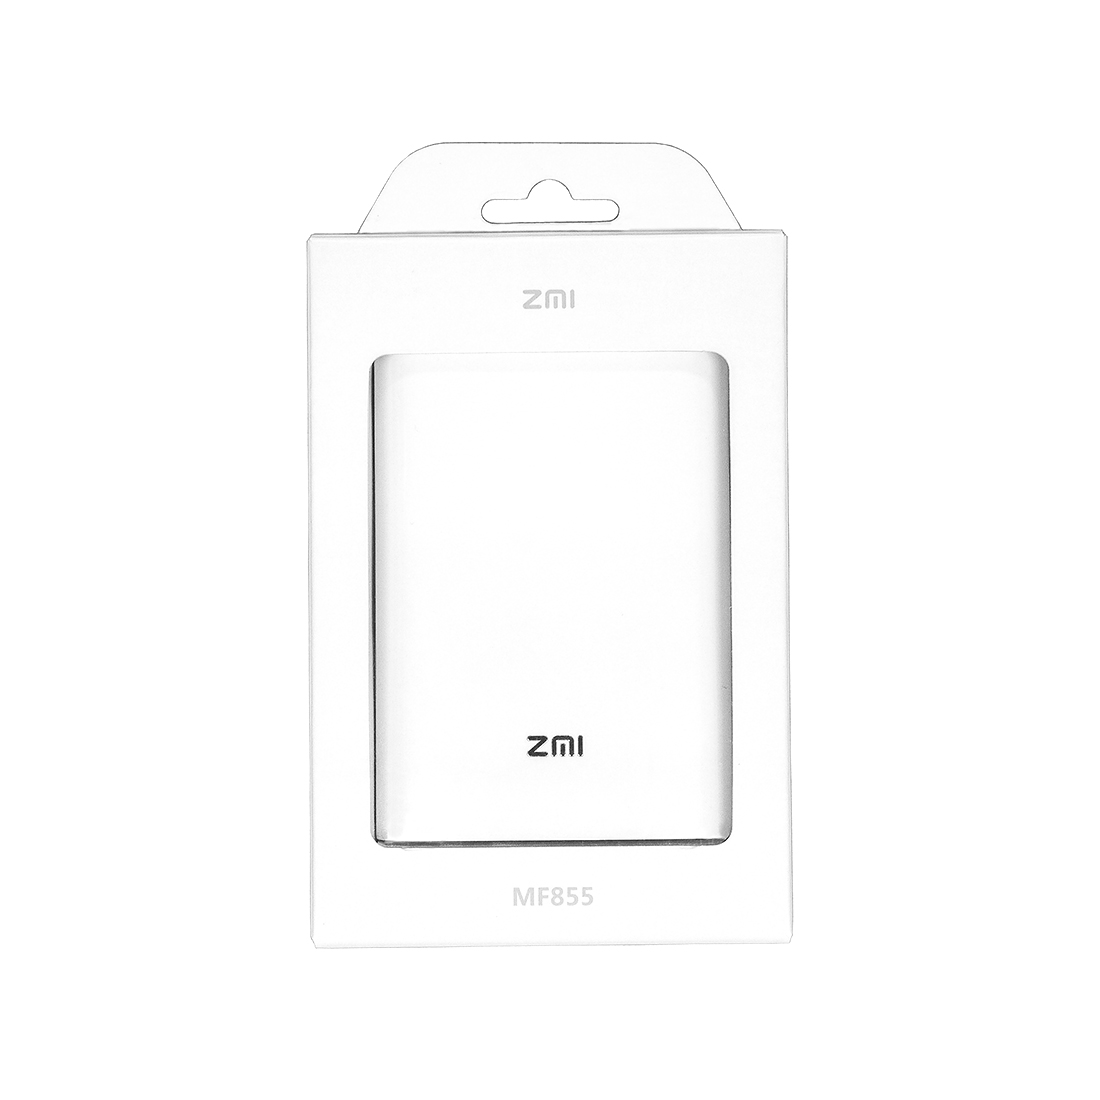 Портативное зарядное устройство -роутер Xiaomi ZMi MF855 7800mAh Белый